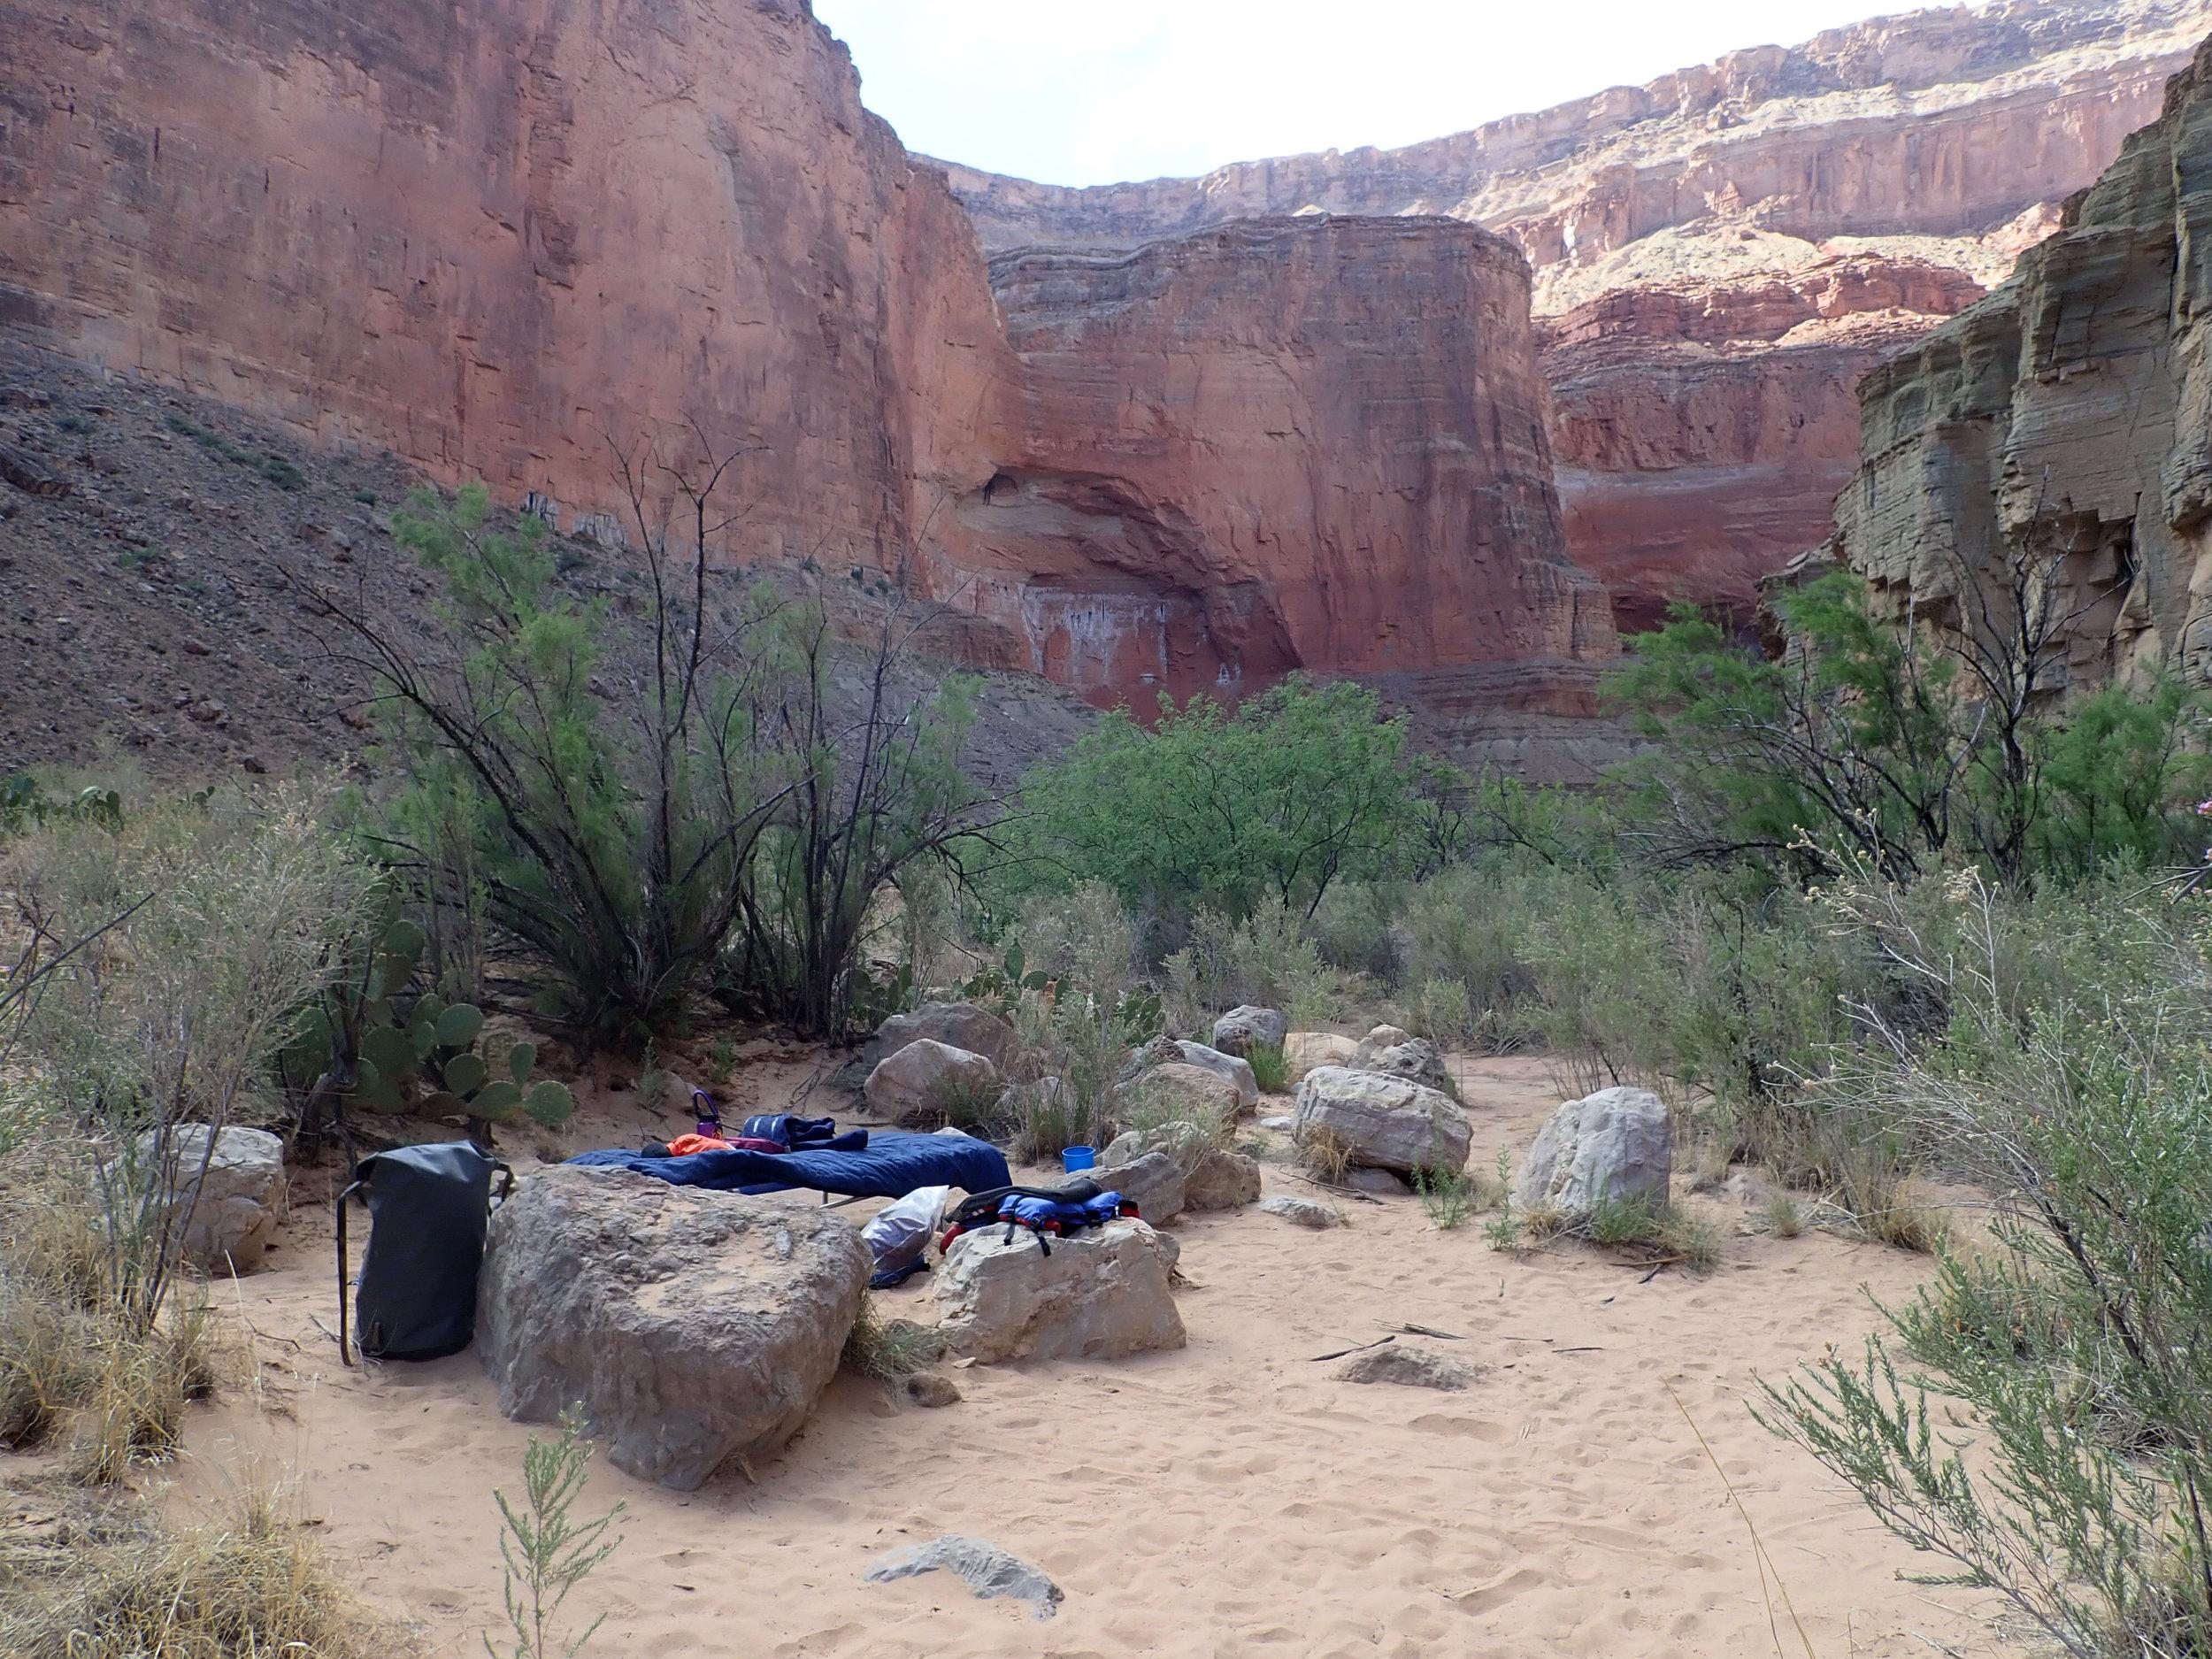 My 'bedroom' at mile 47 1/2, Upper Saddle Camp